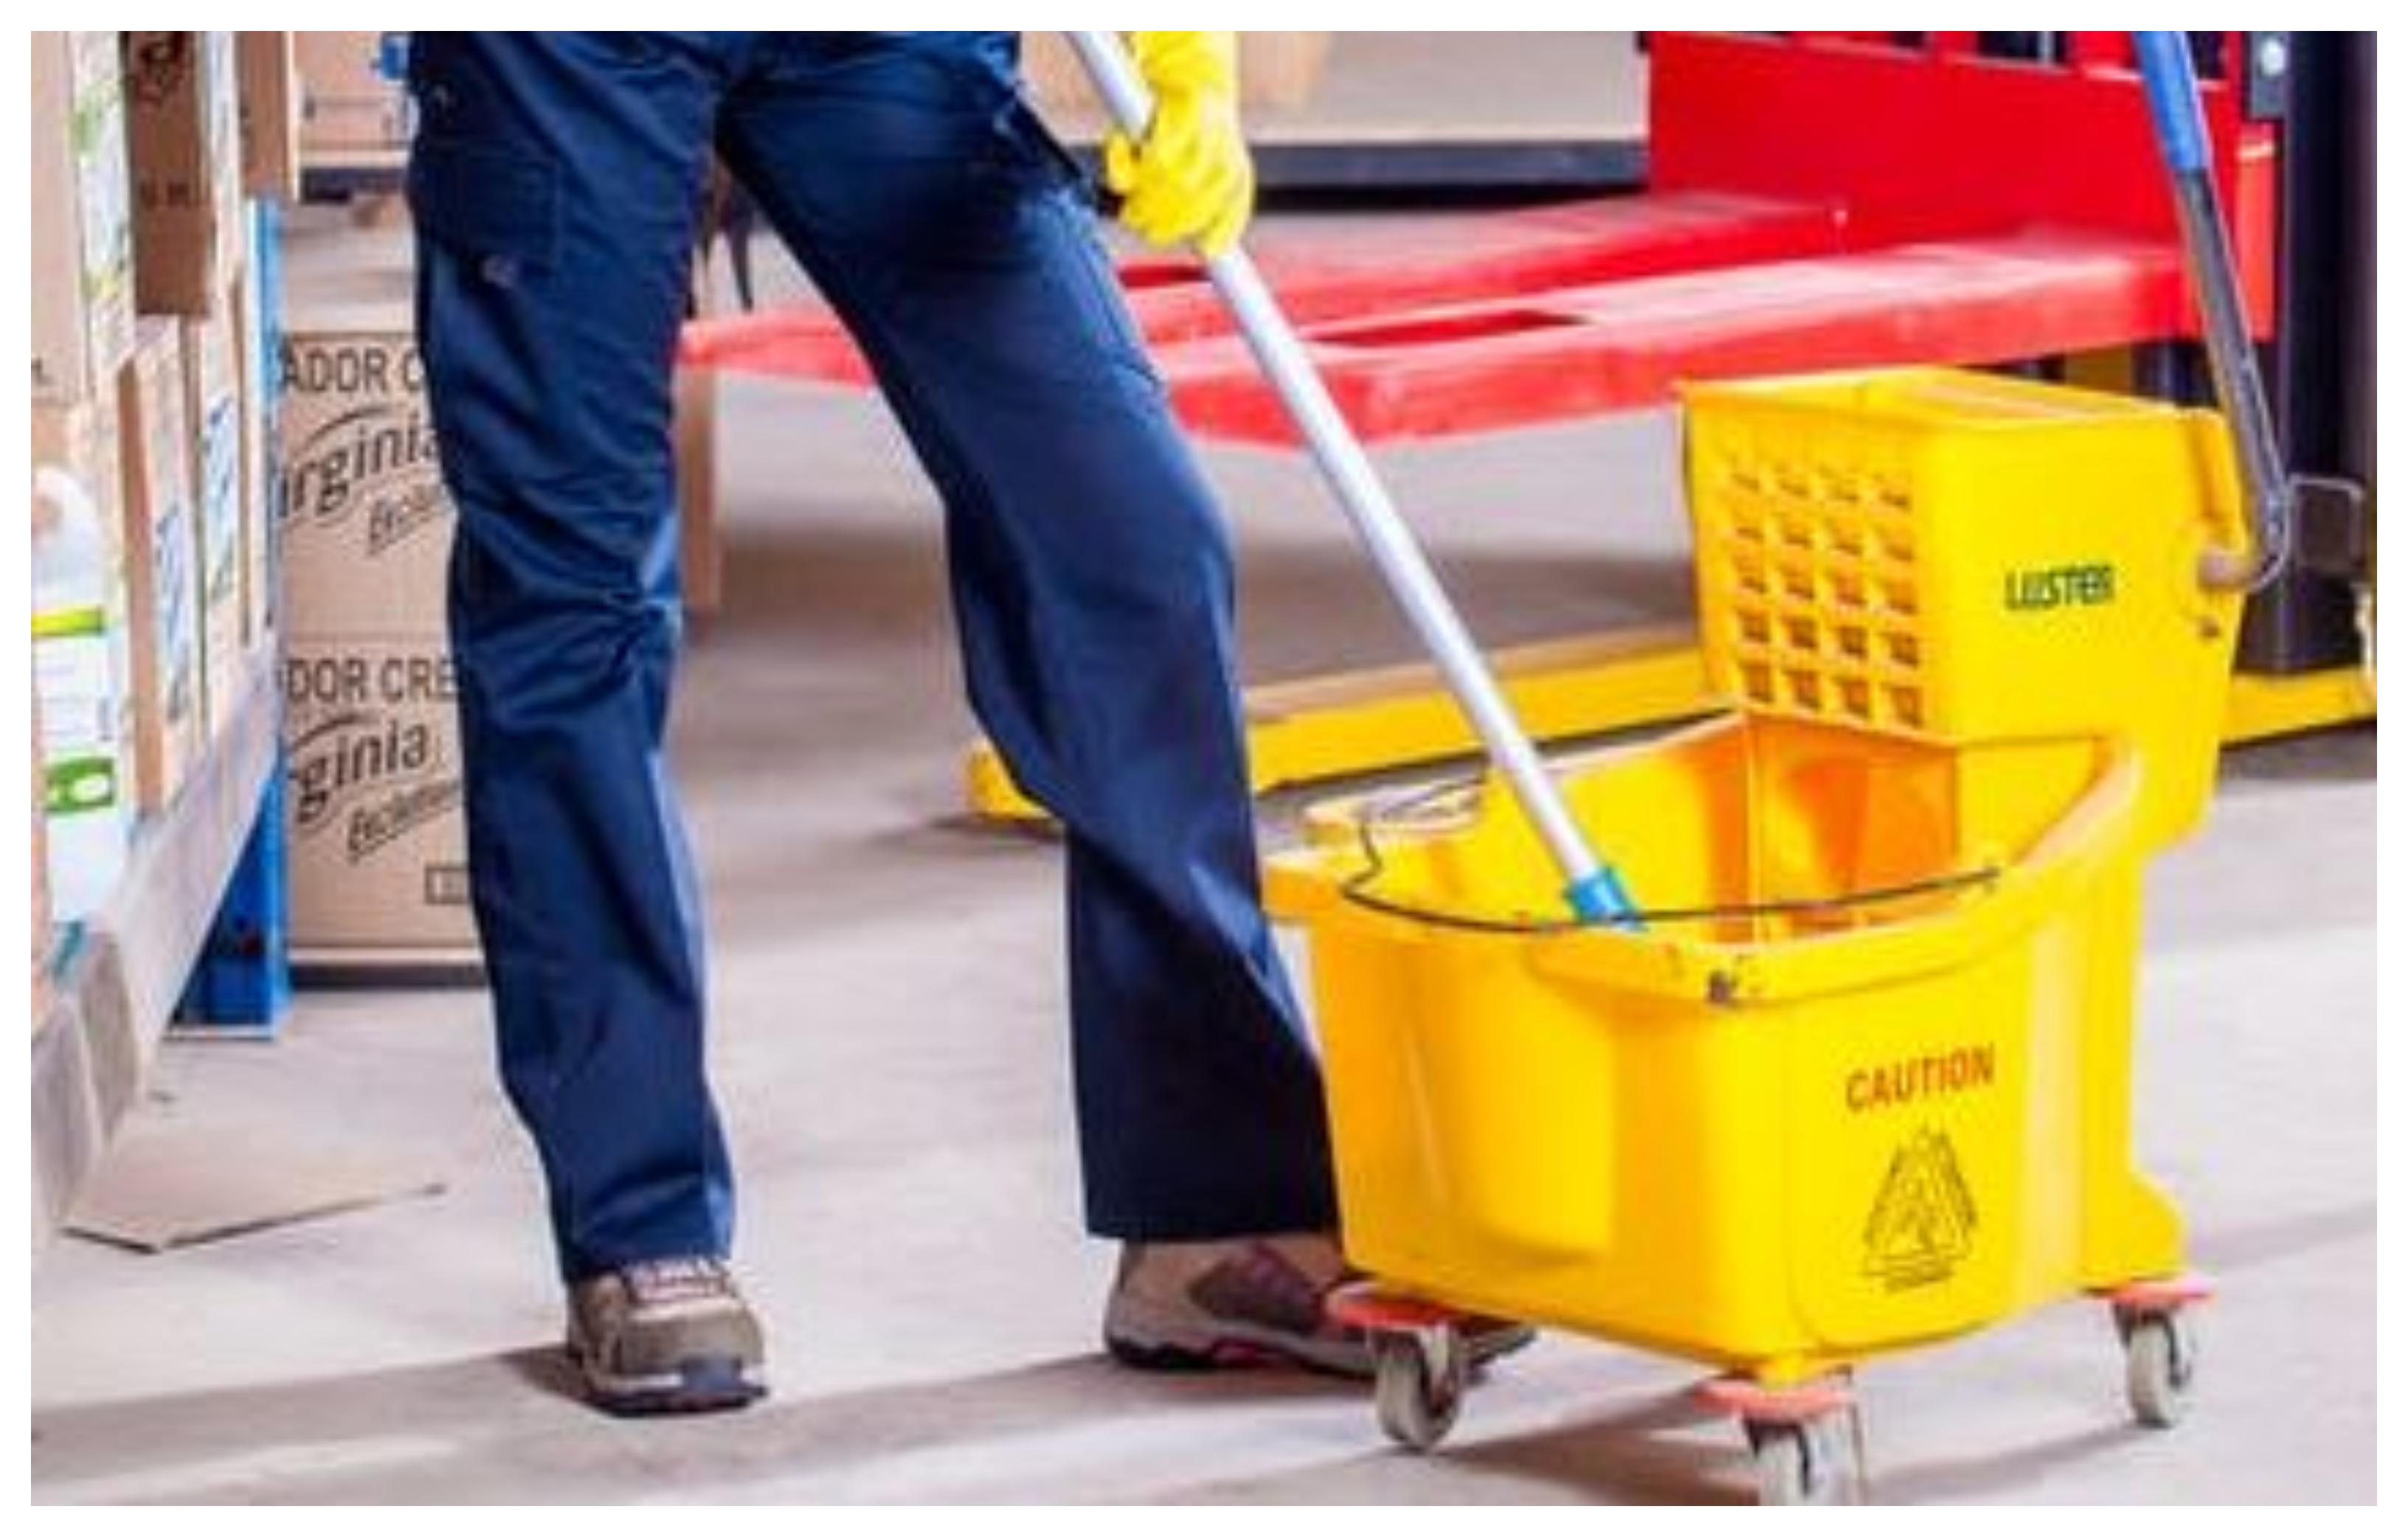 <span class='p-name'>Carrelli per imprese di pulizie: un valido aiuto</span>